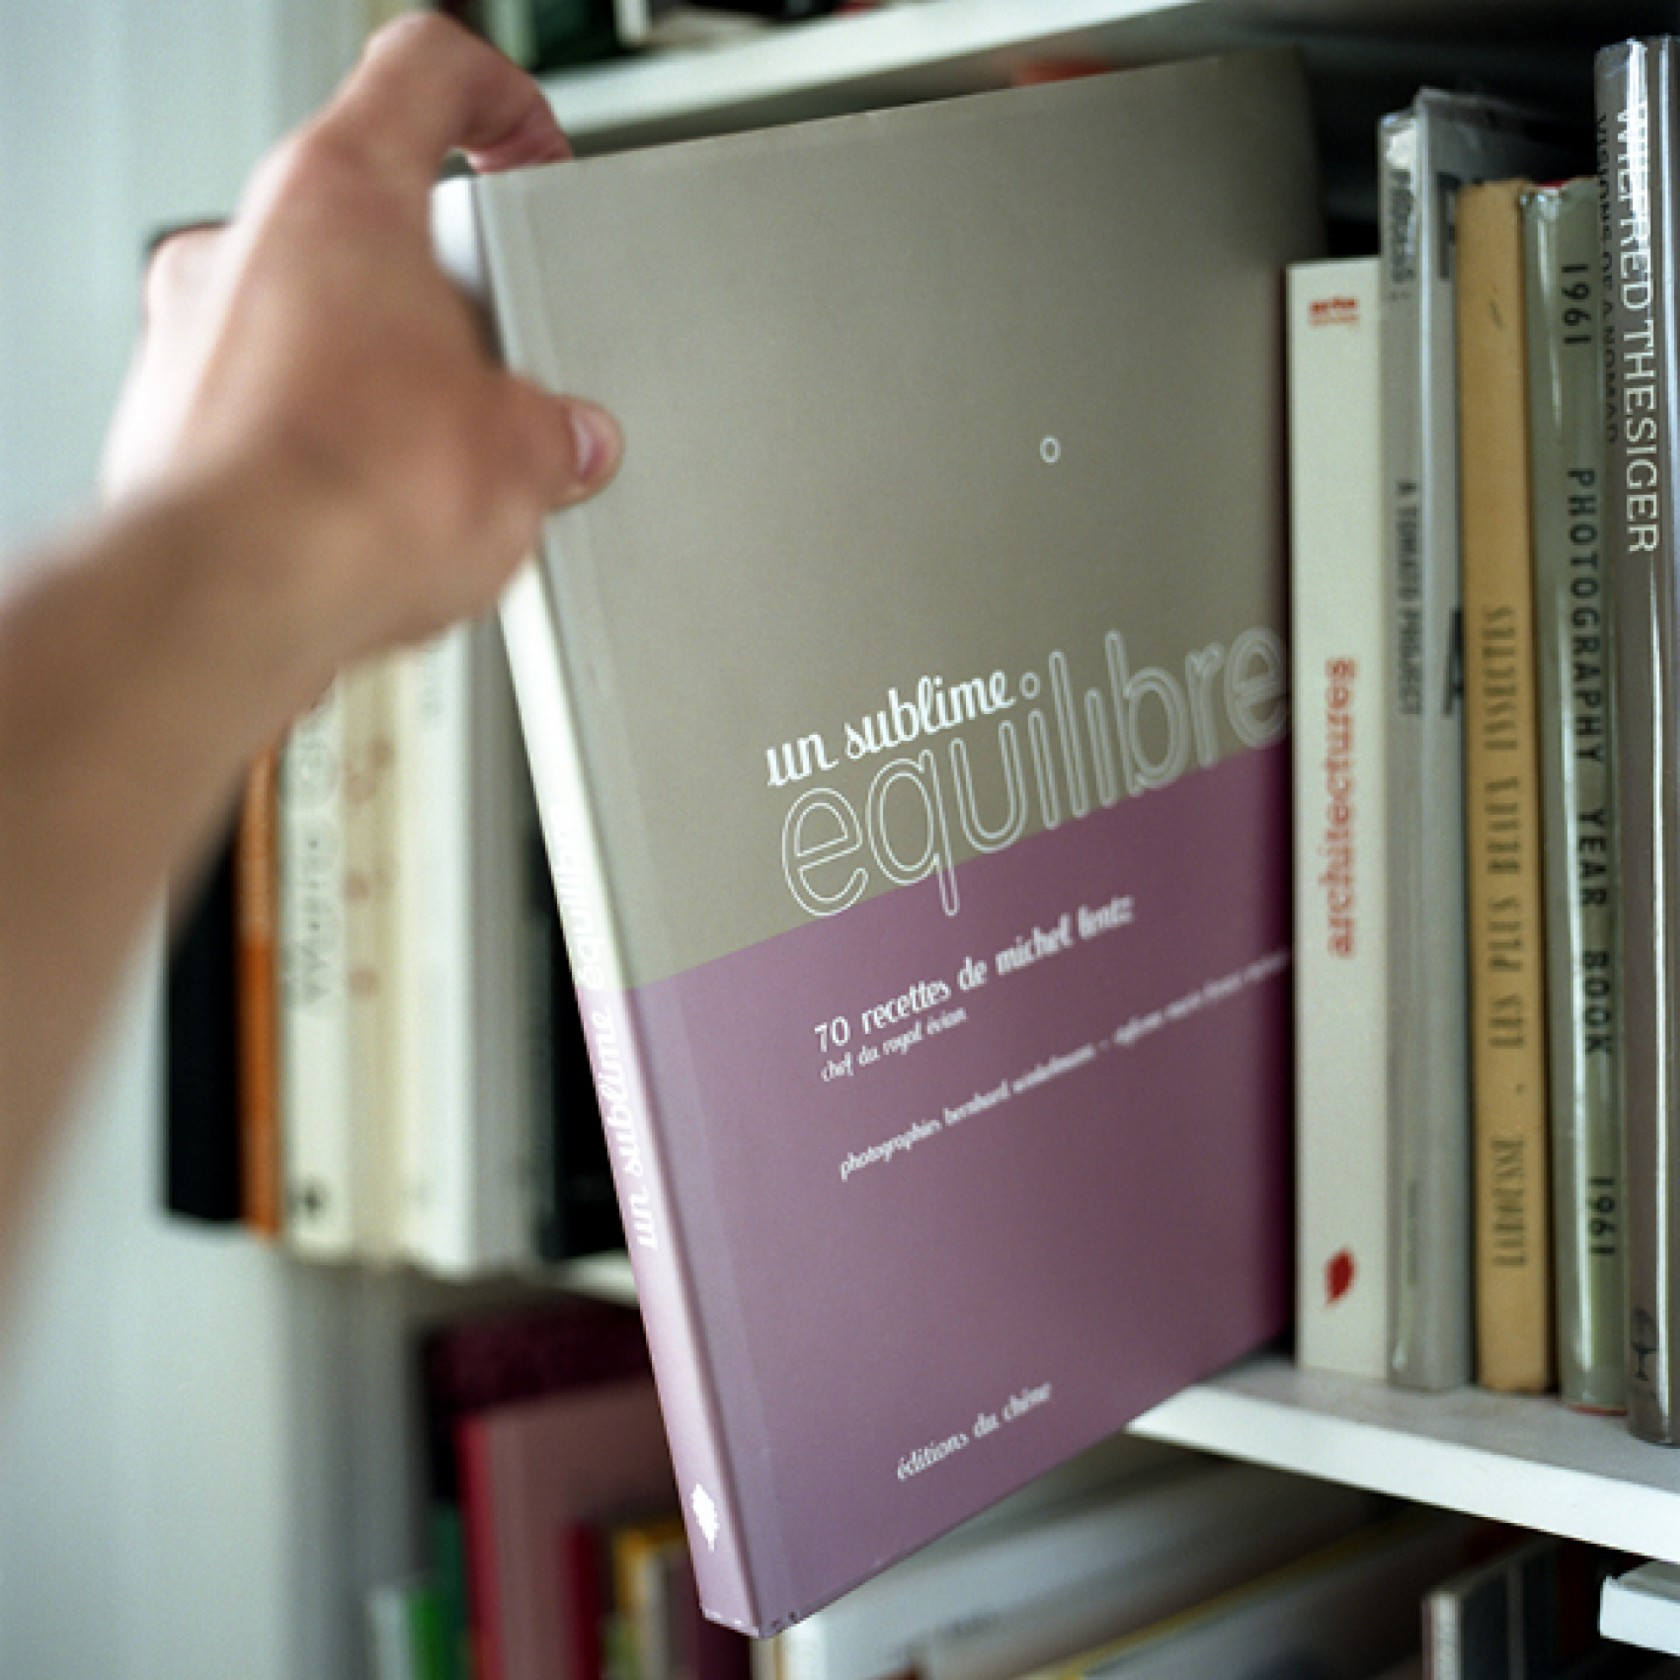 fouinzanardi -  fz_print.books_editionsduchene9